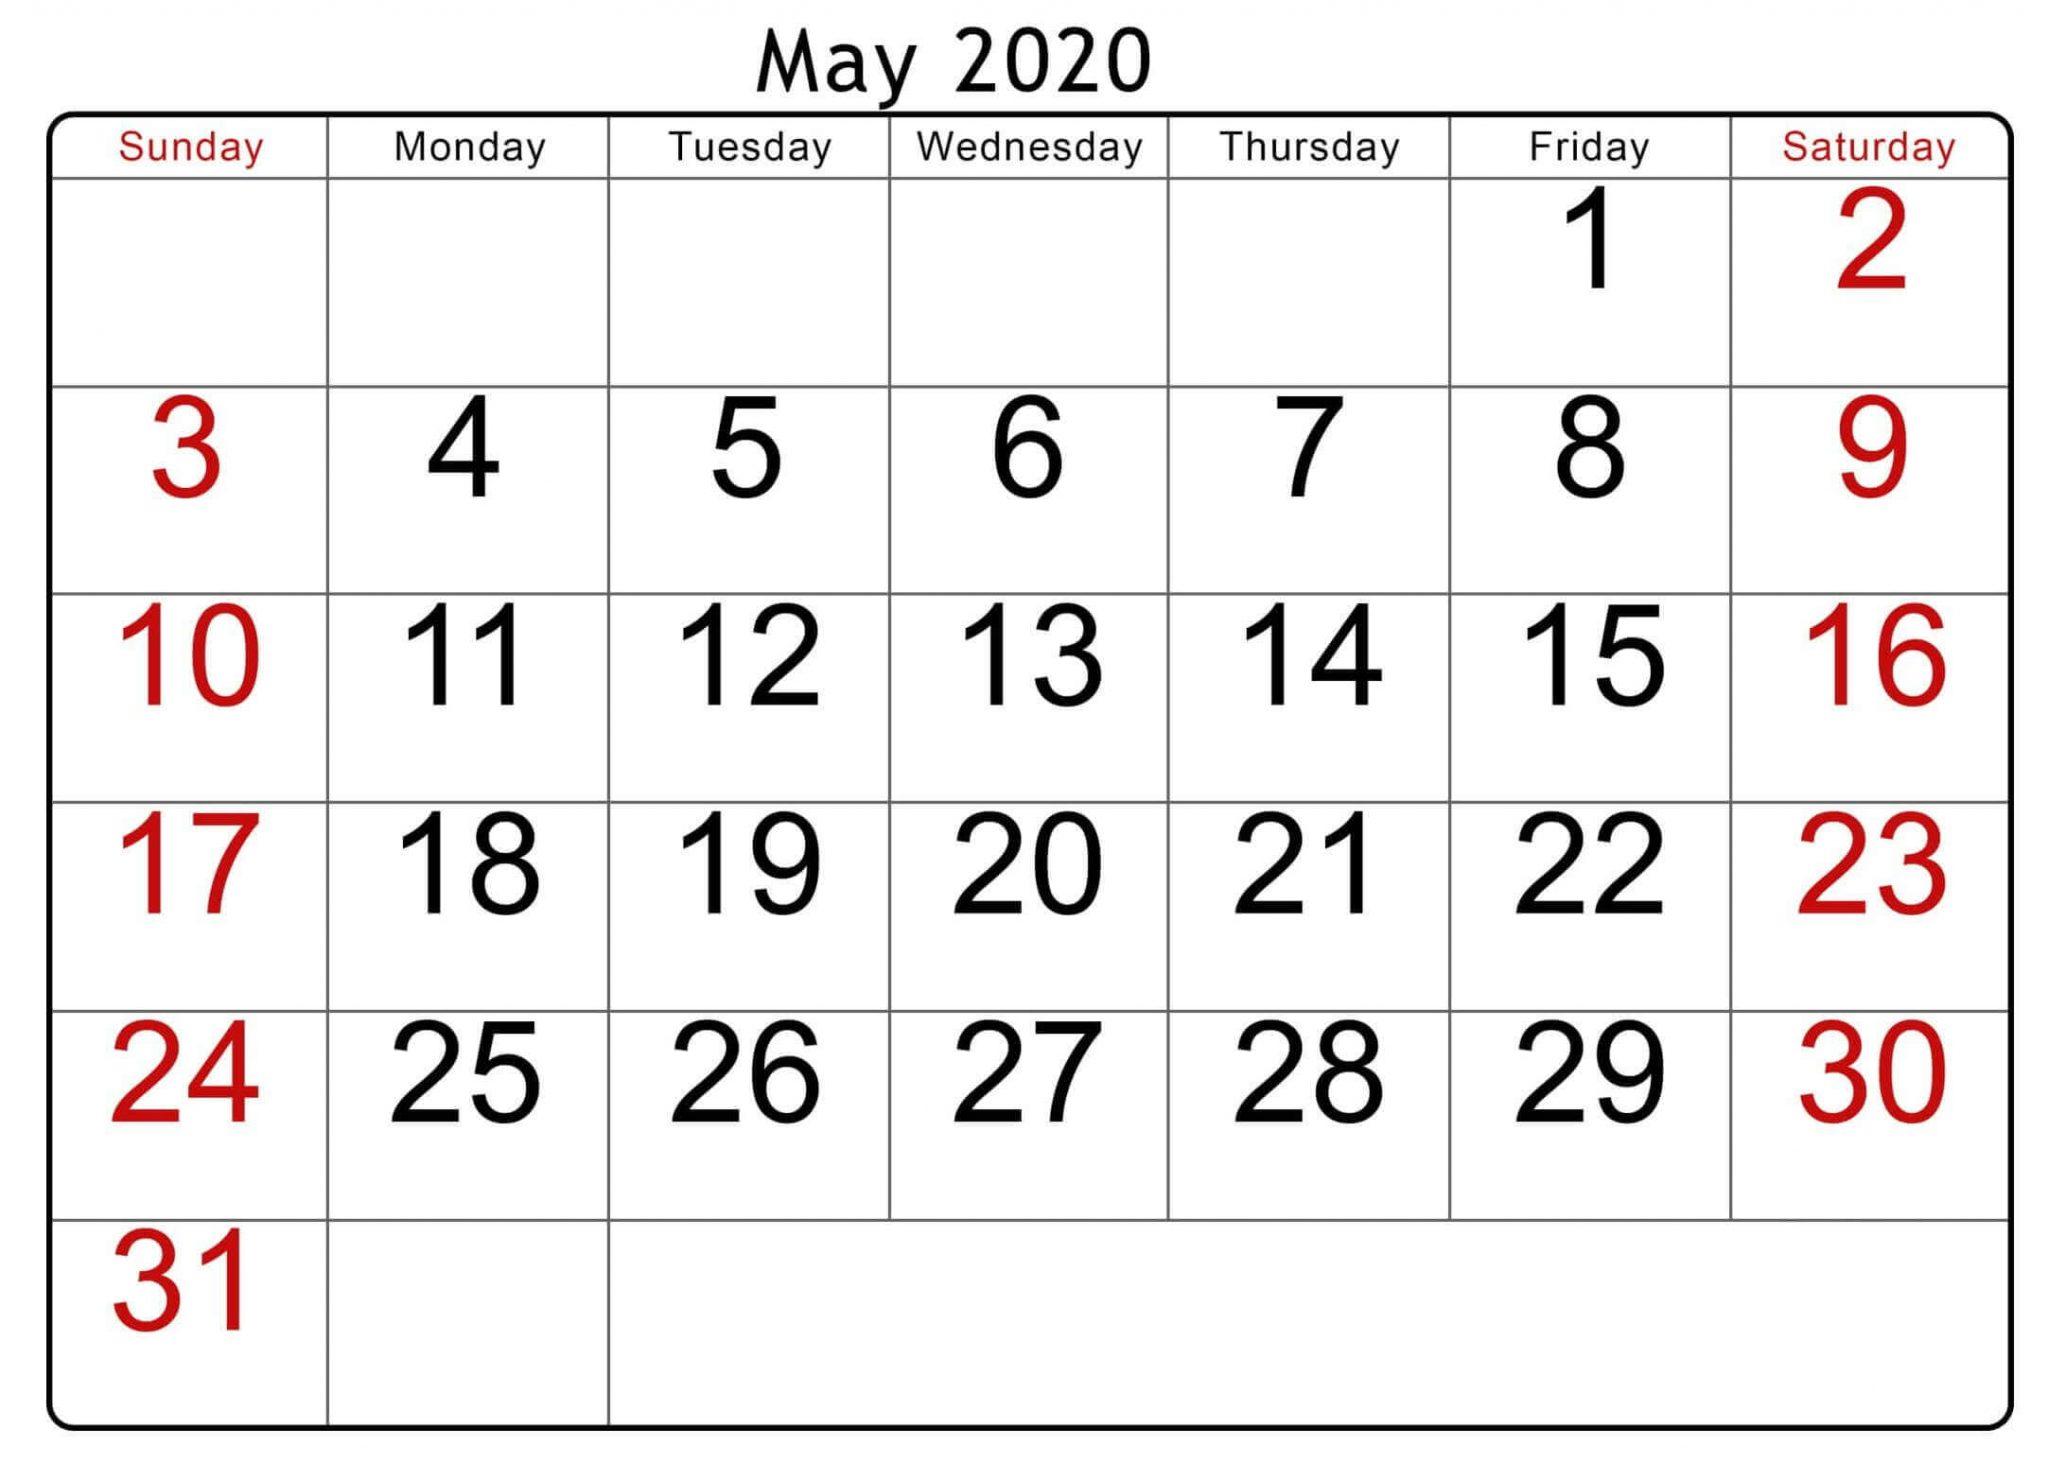 Print May 2020 PDf Calendar